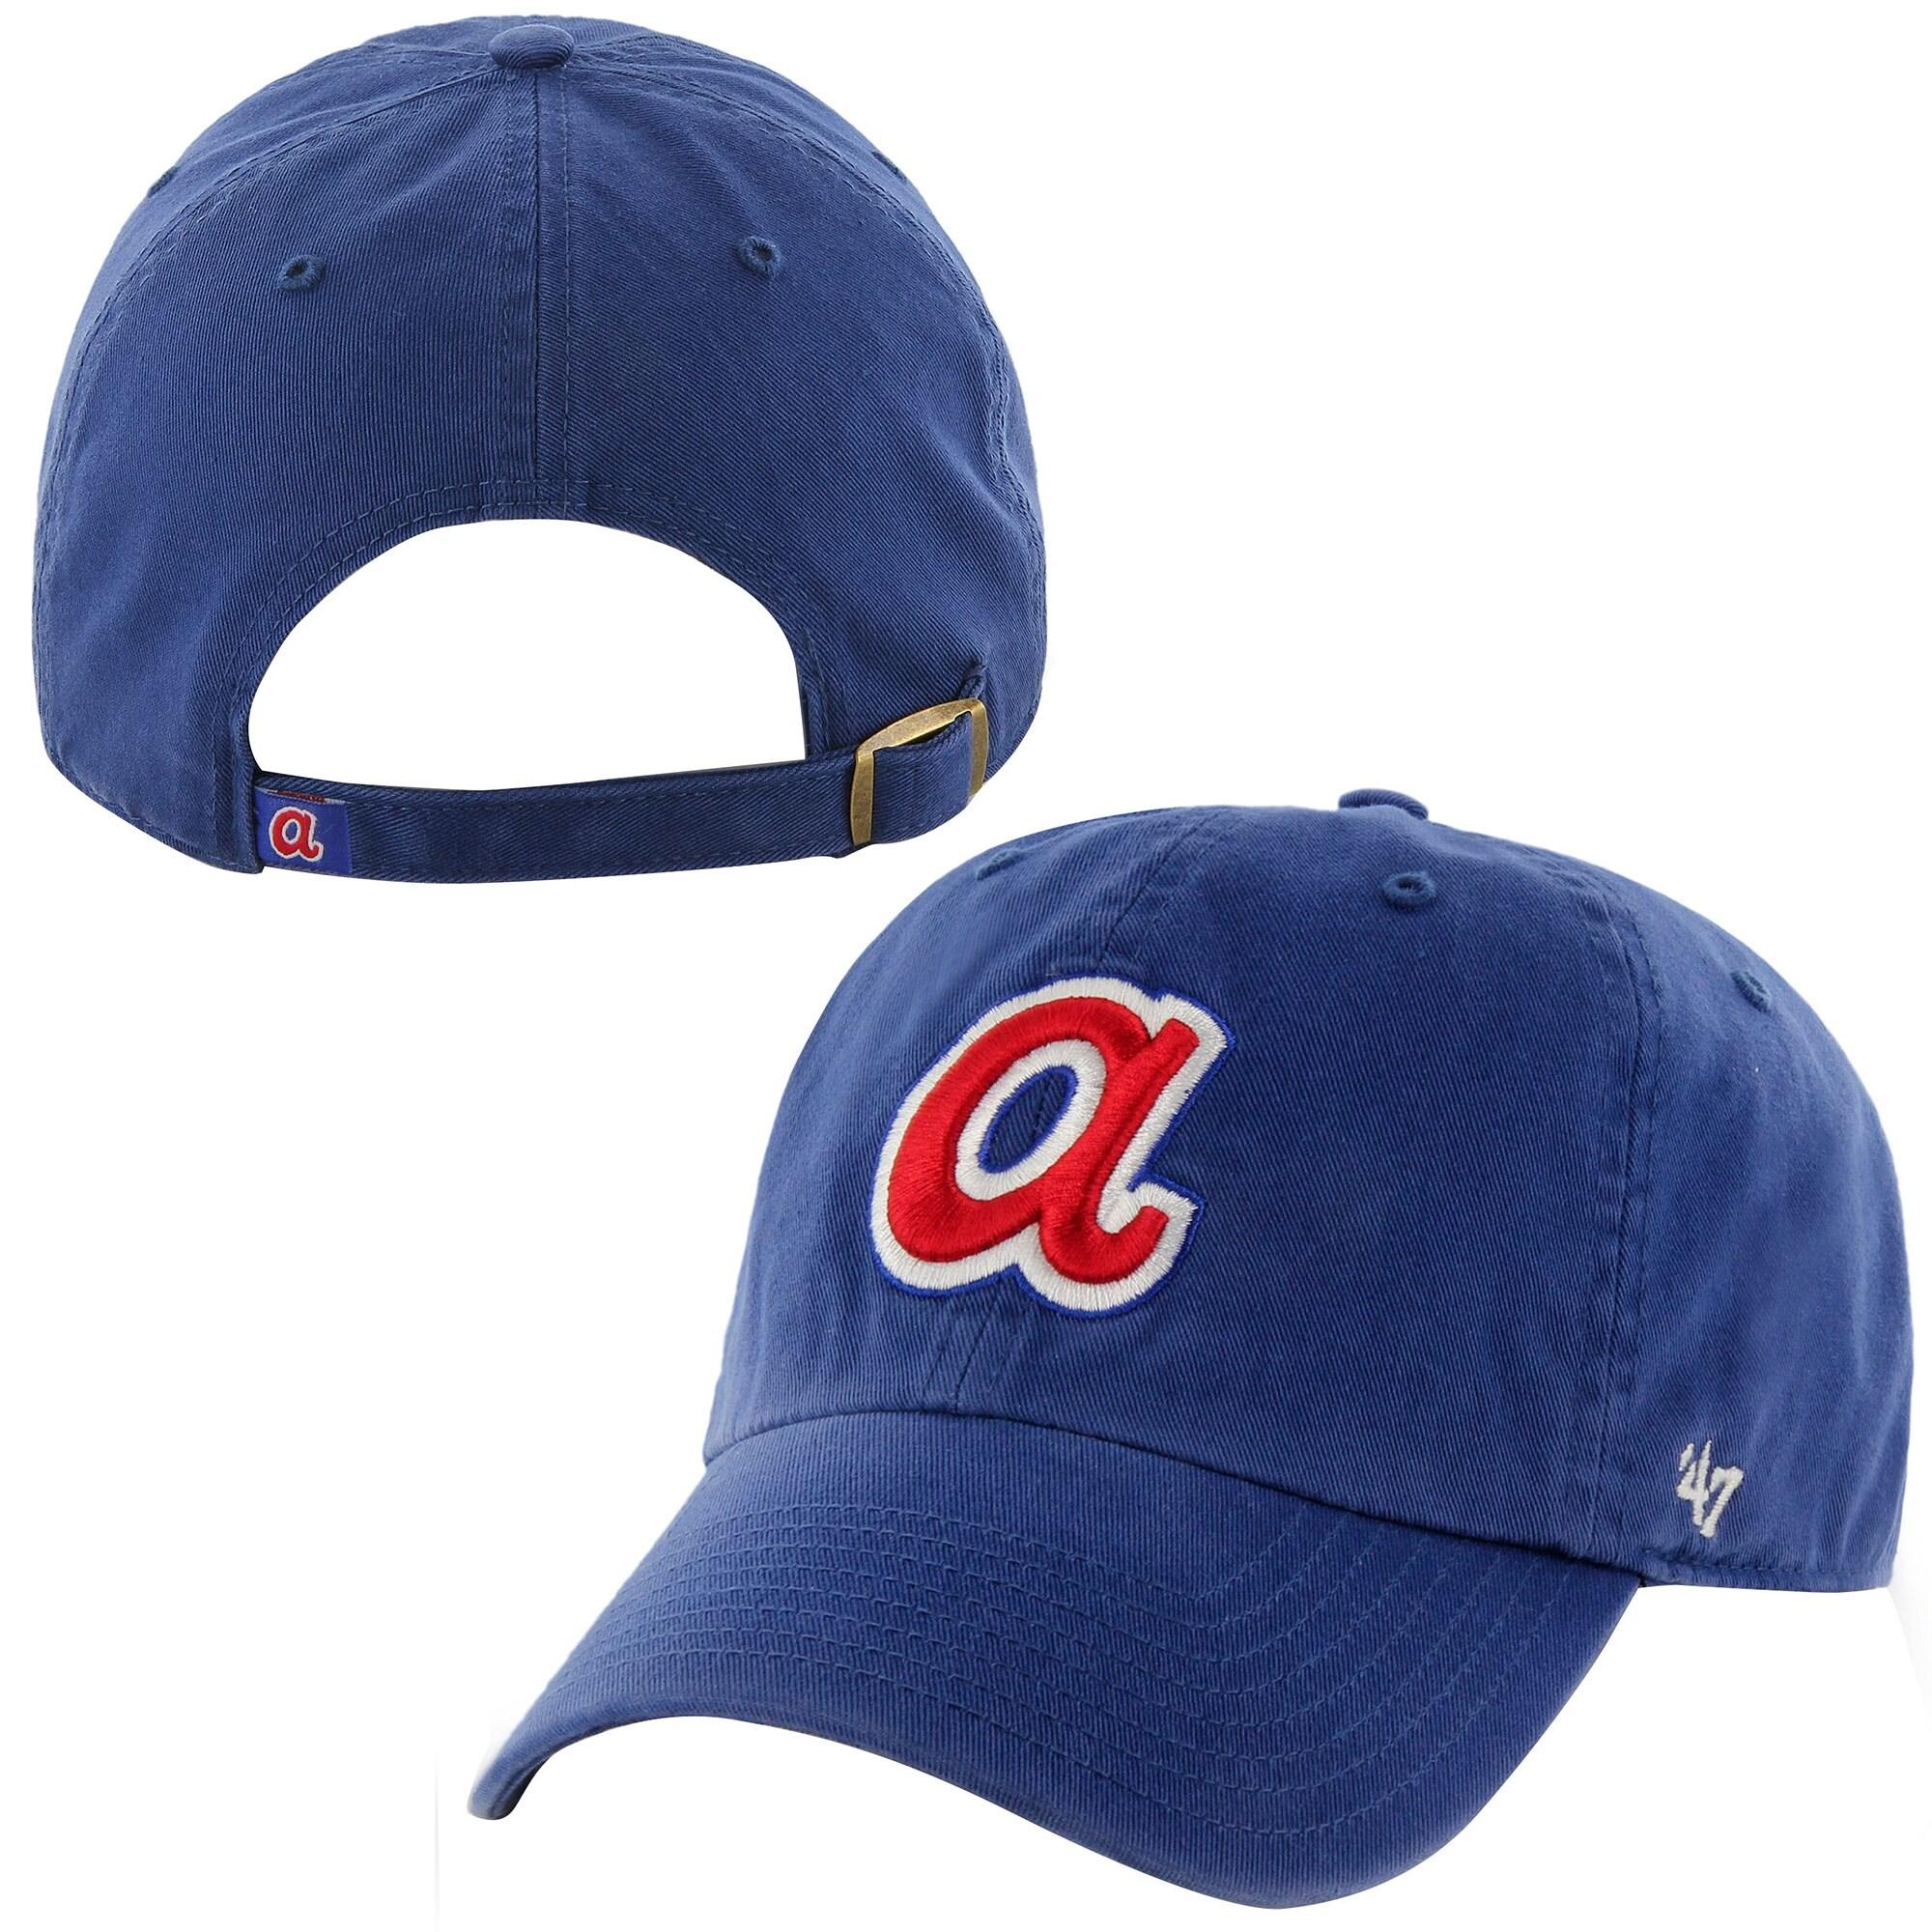 Atlanta Braves '47 Brand 1972 Cooperstown Collection Basic Logo Cleanup Adjustable Hat - Royal Blue